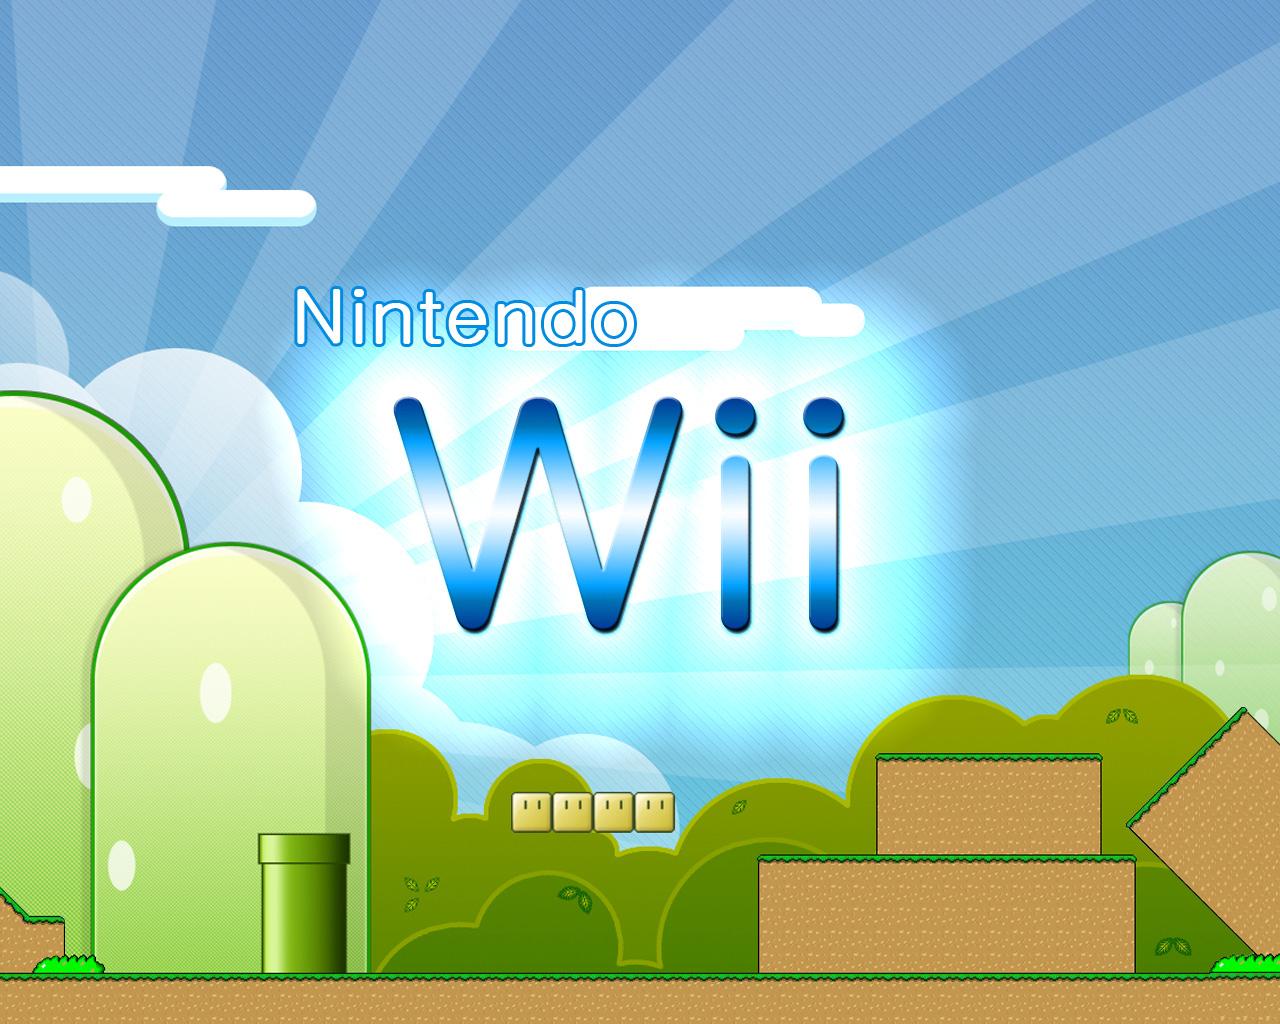 Arabic Girl Wallpaper Top World Pic Nintendo Wii Wallpapers